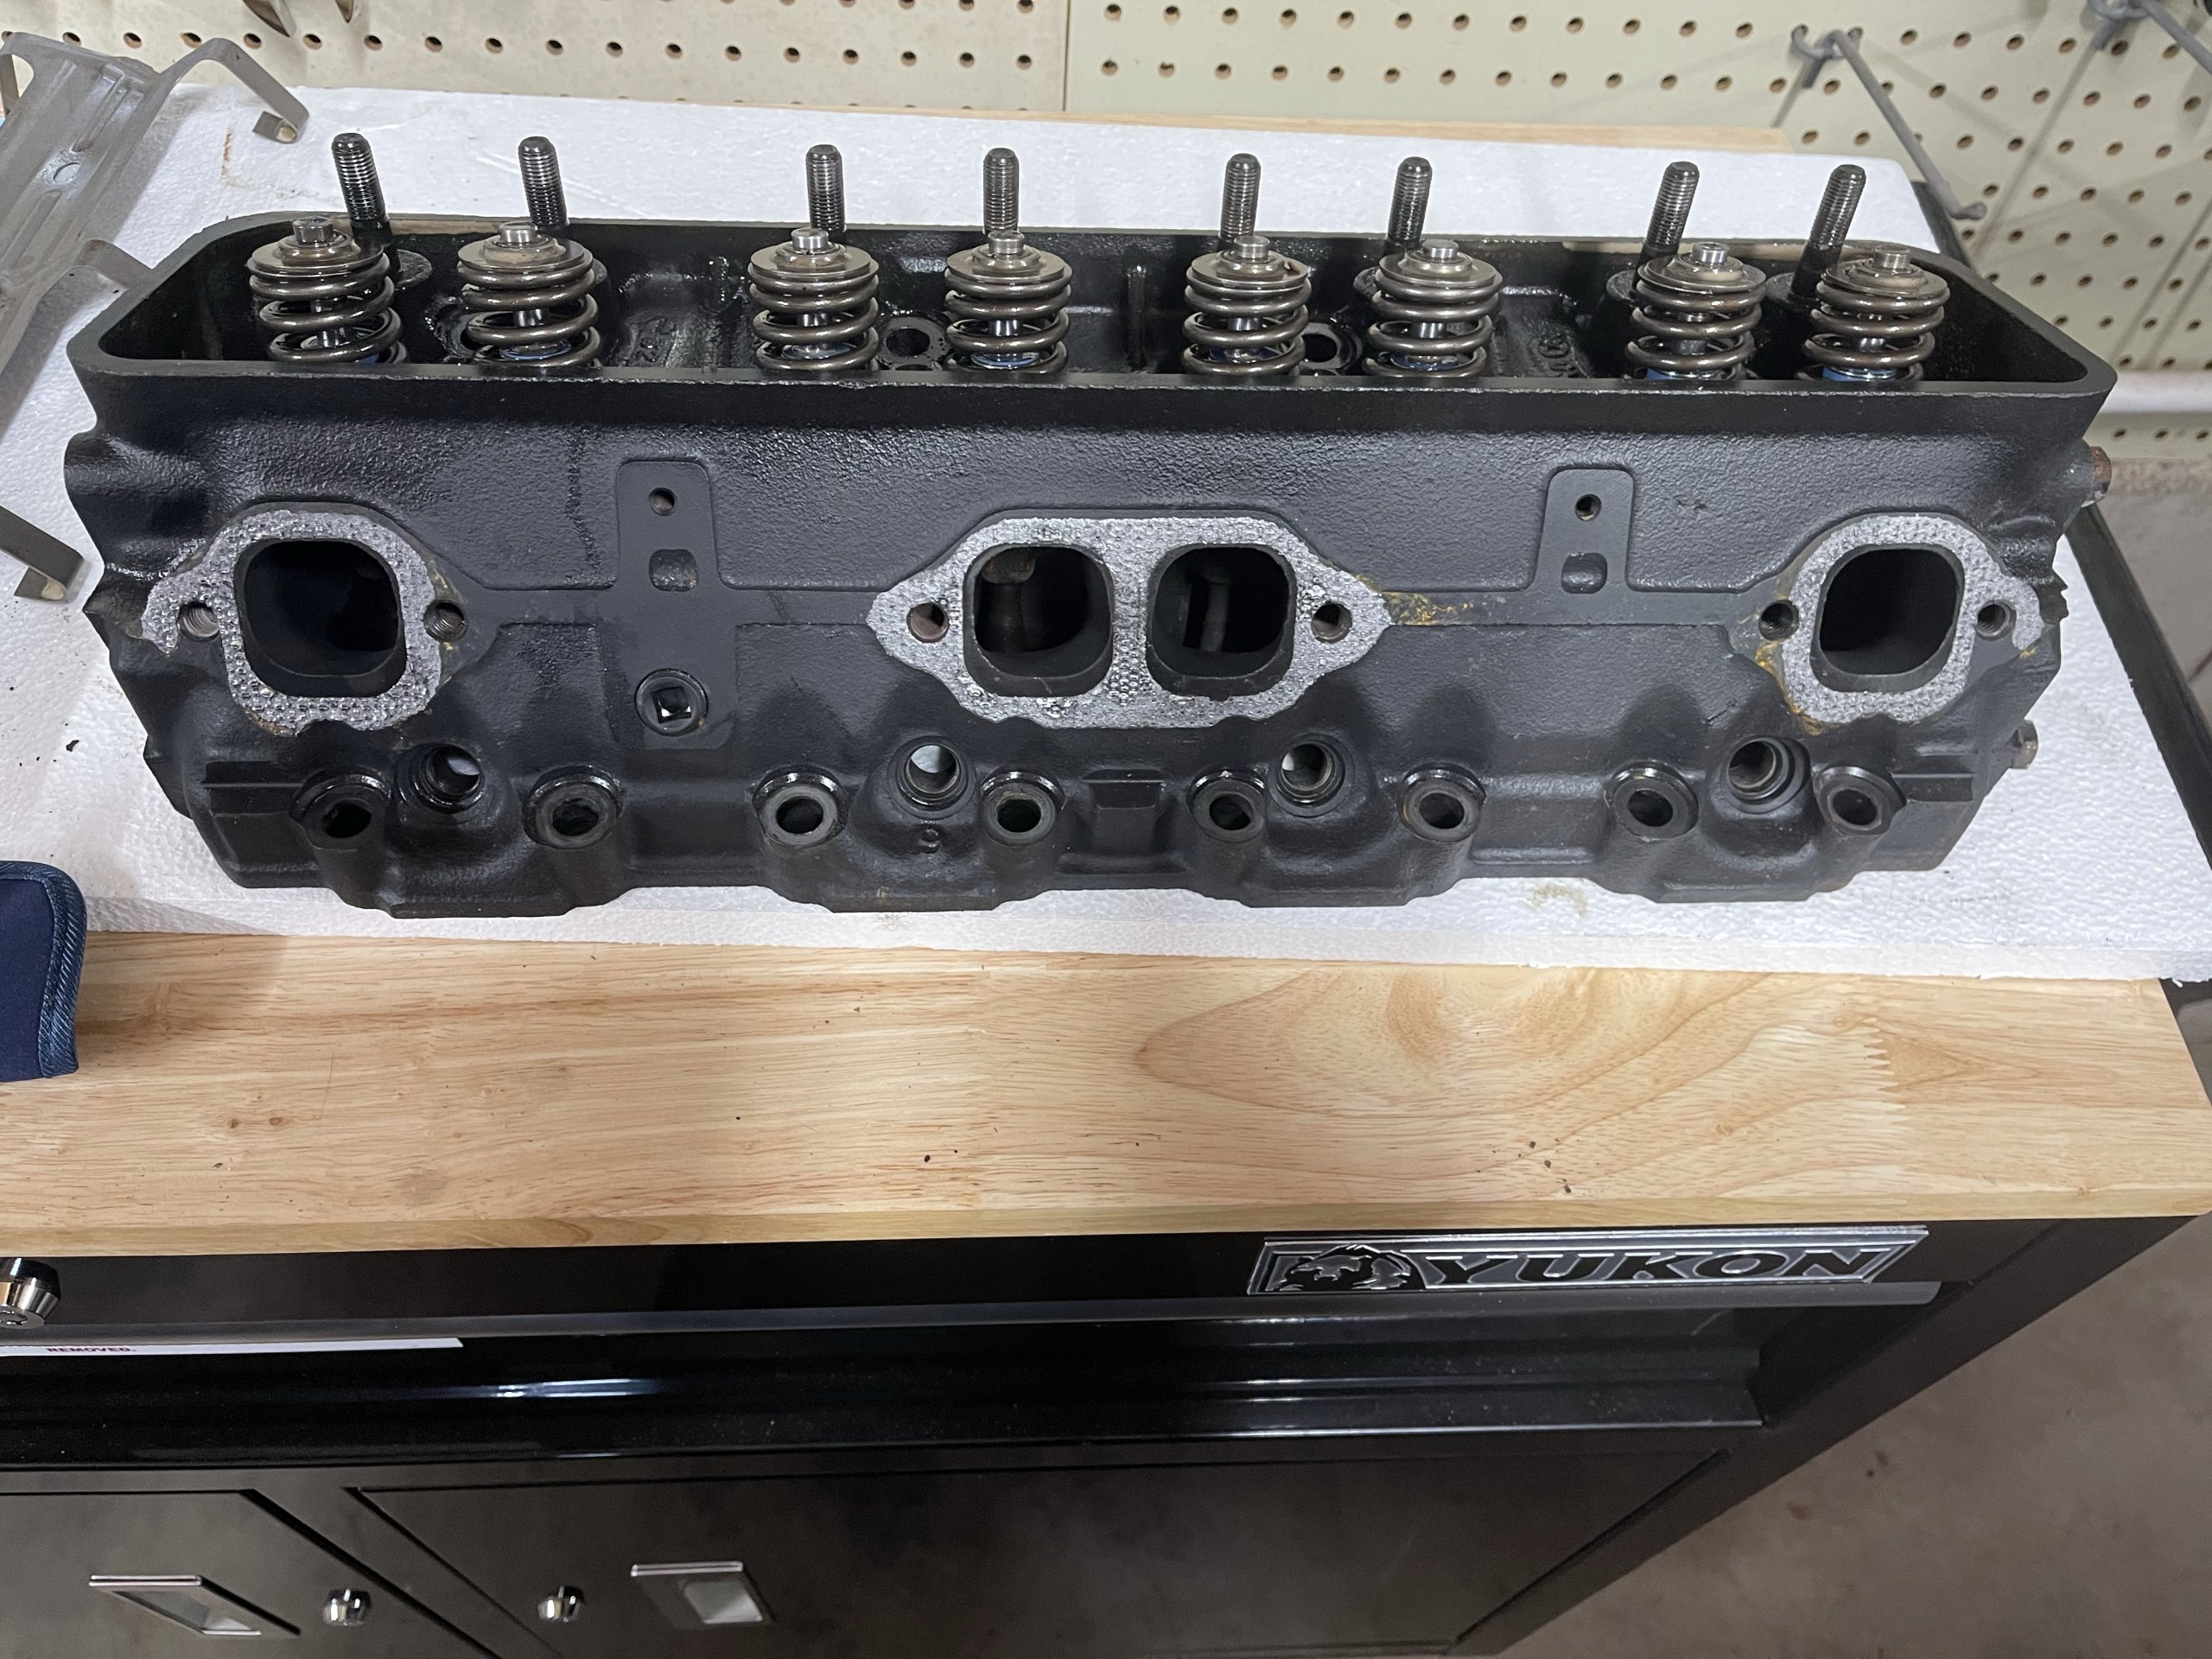 Starboard Cylinder Head Exhaust Port Inspection